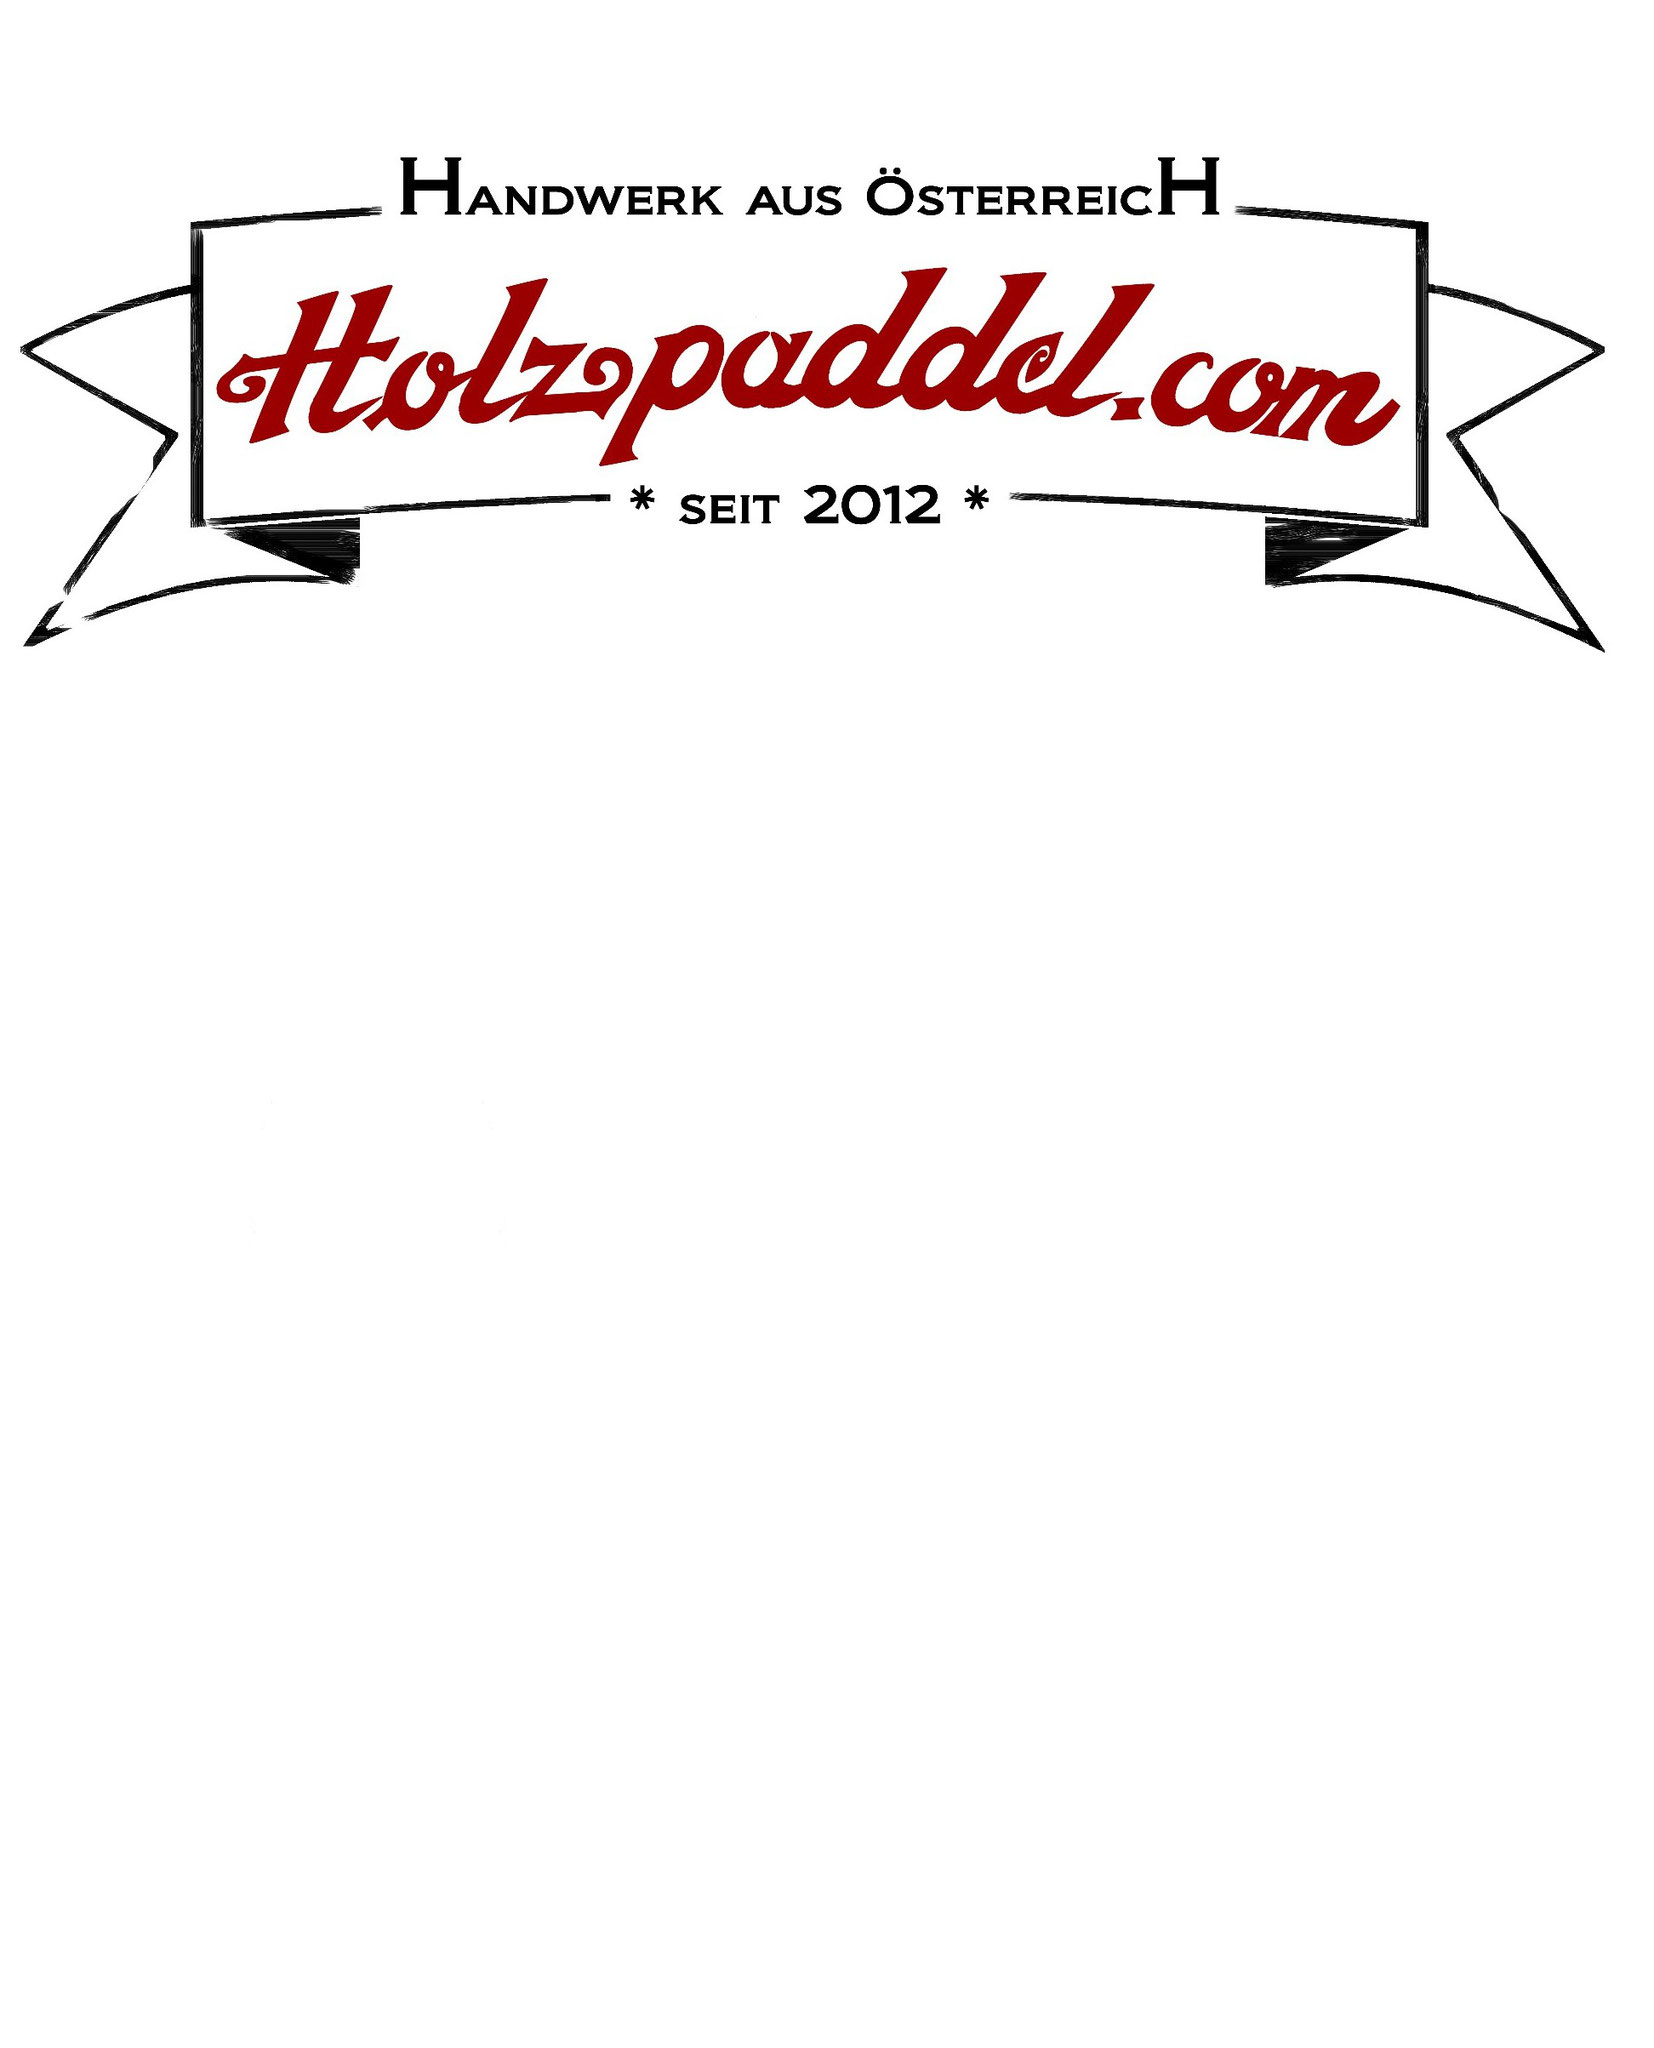 Holzpaddel.com